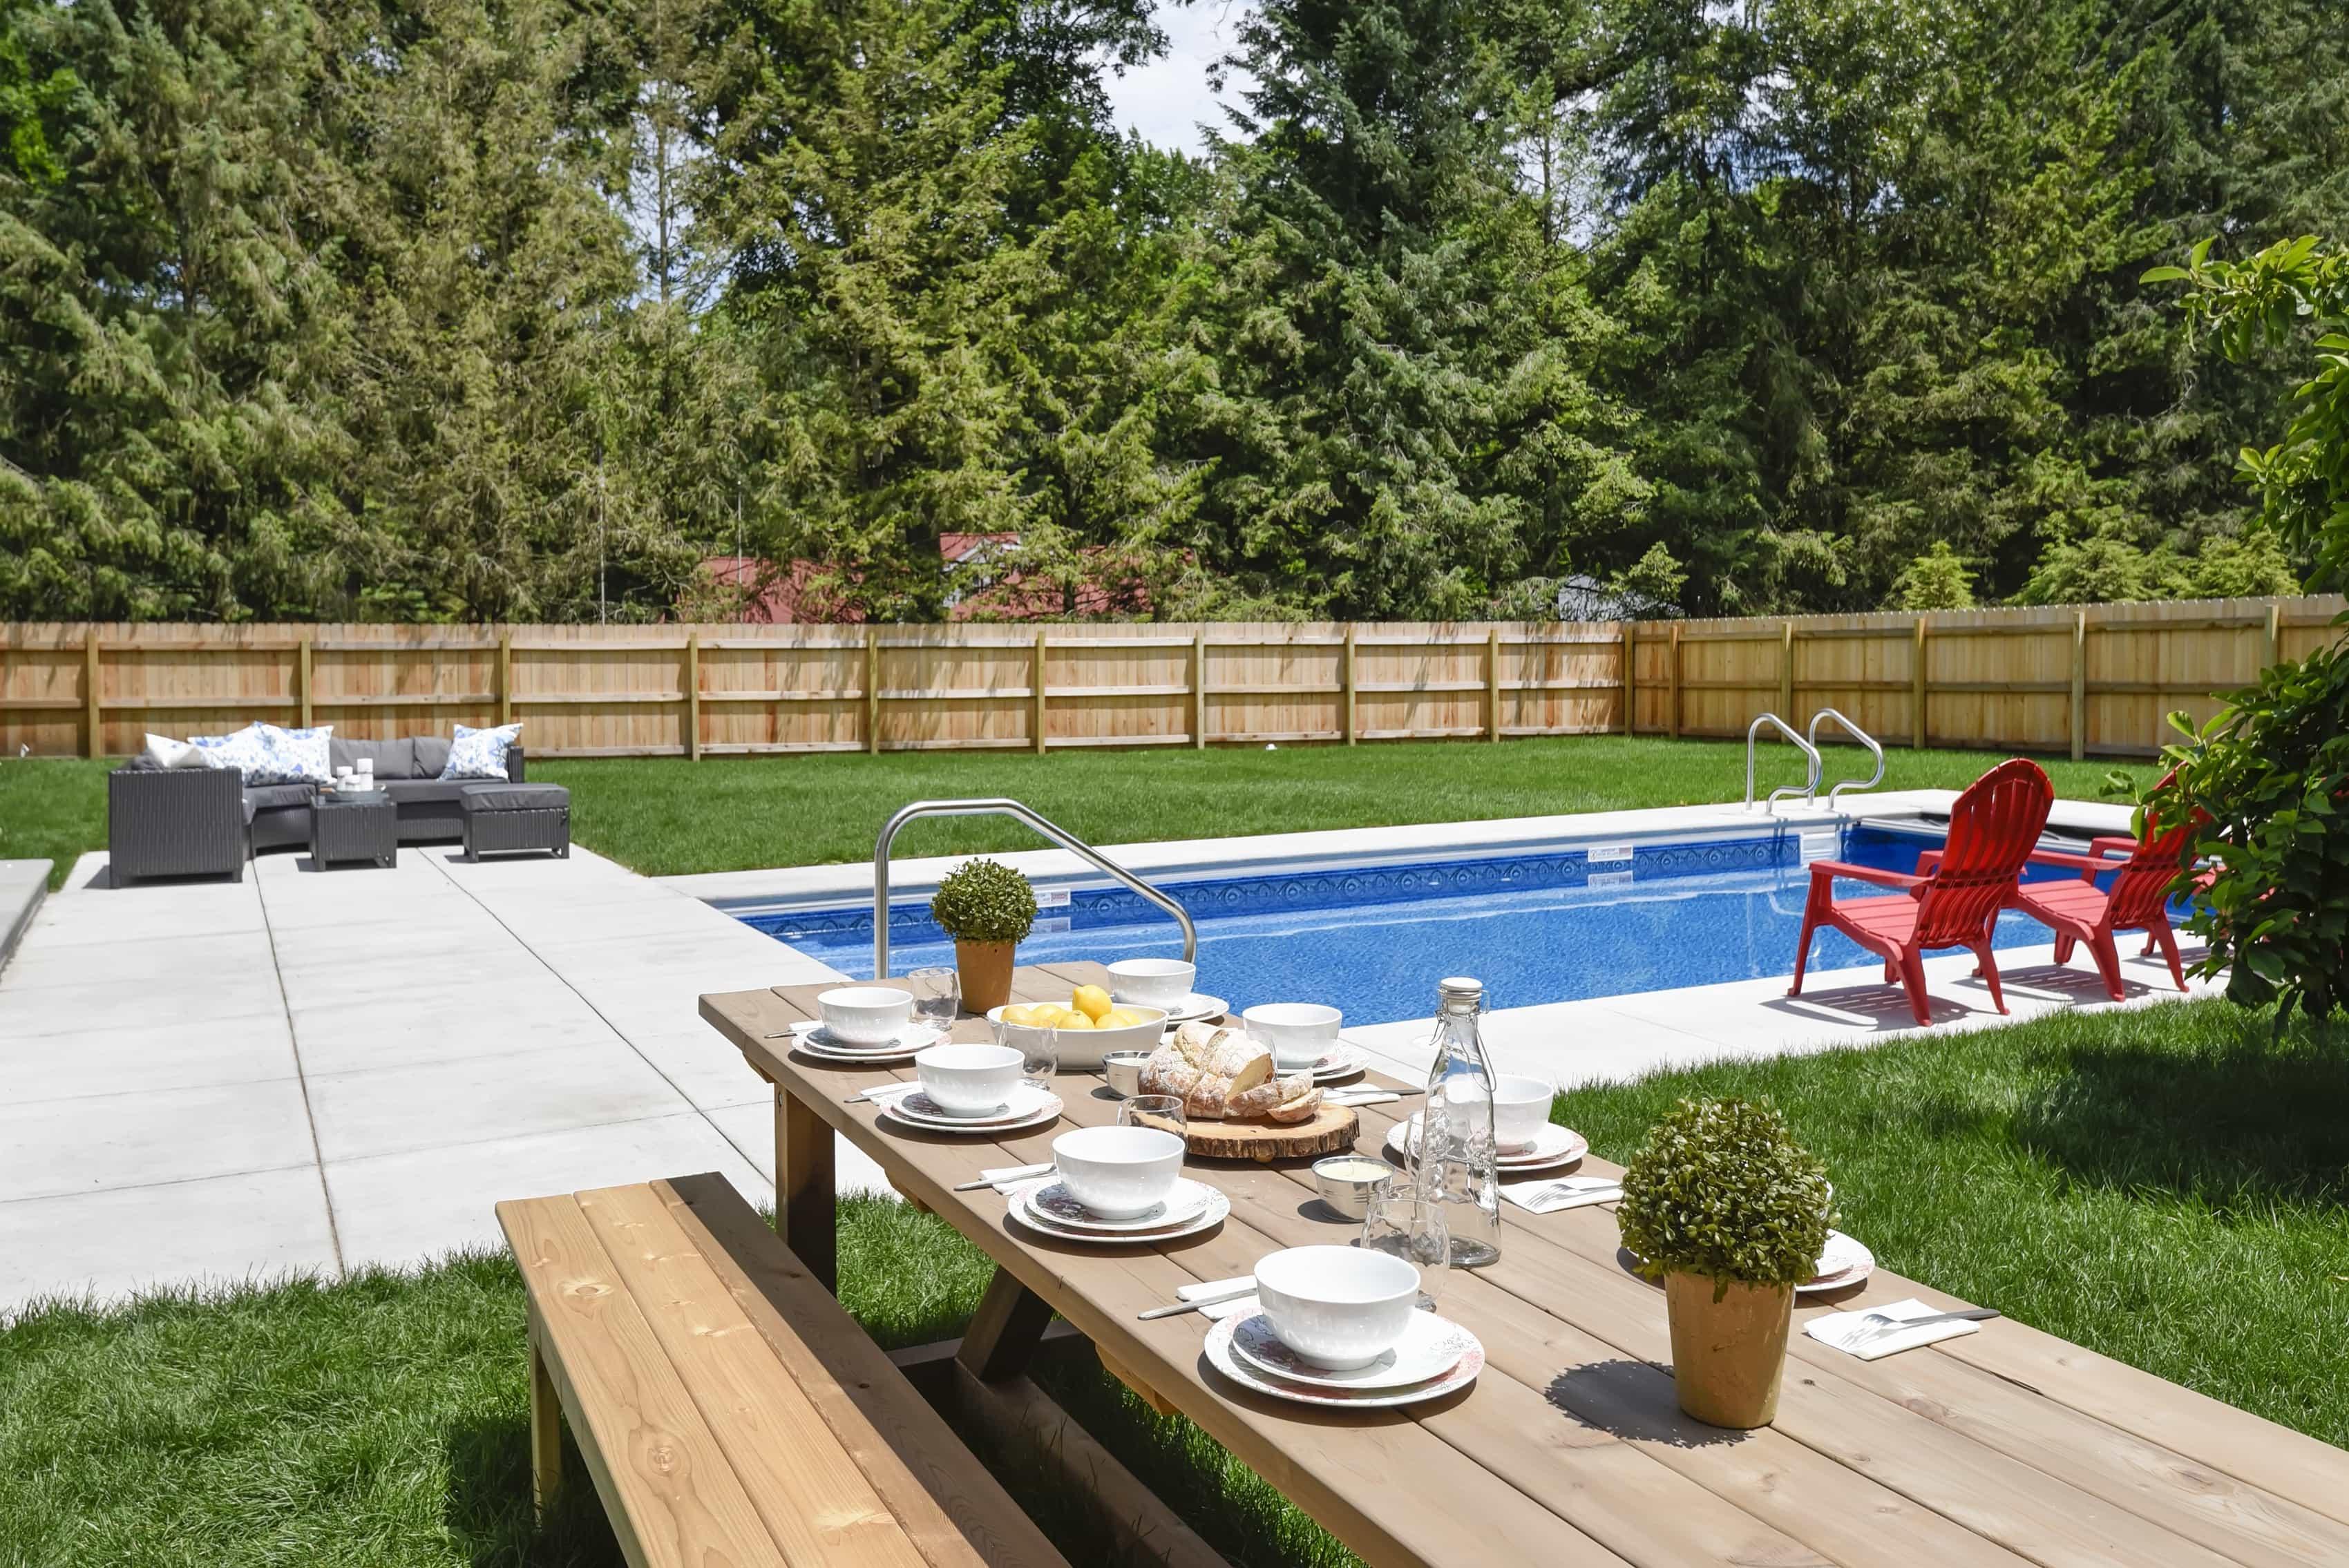 Backyard With Pool And Picnic Table (Image 3 of 25)